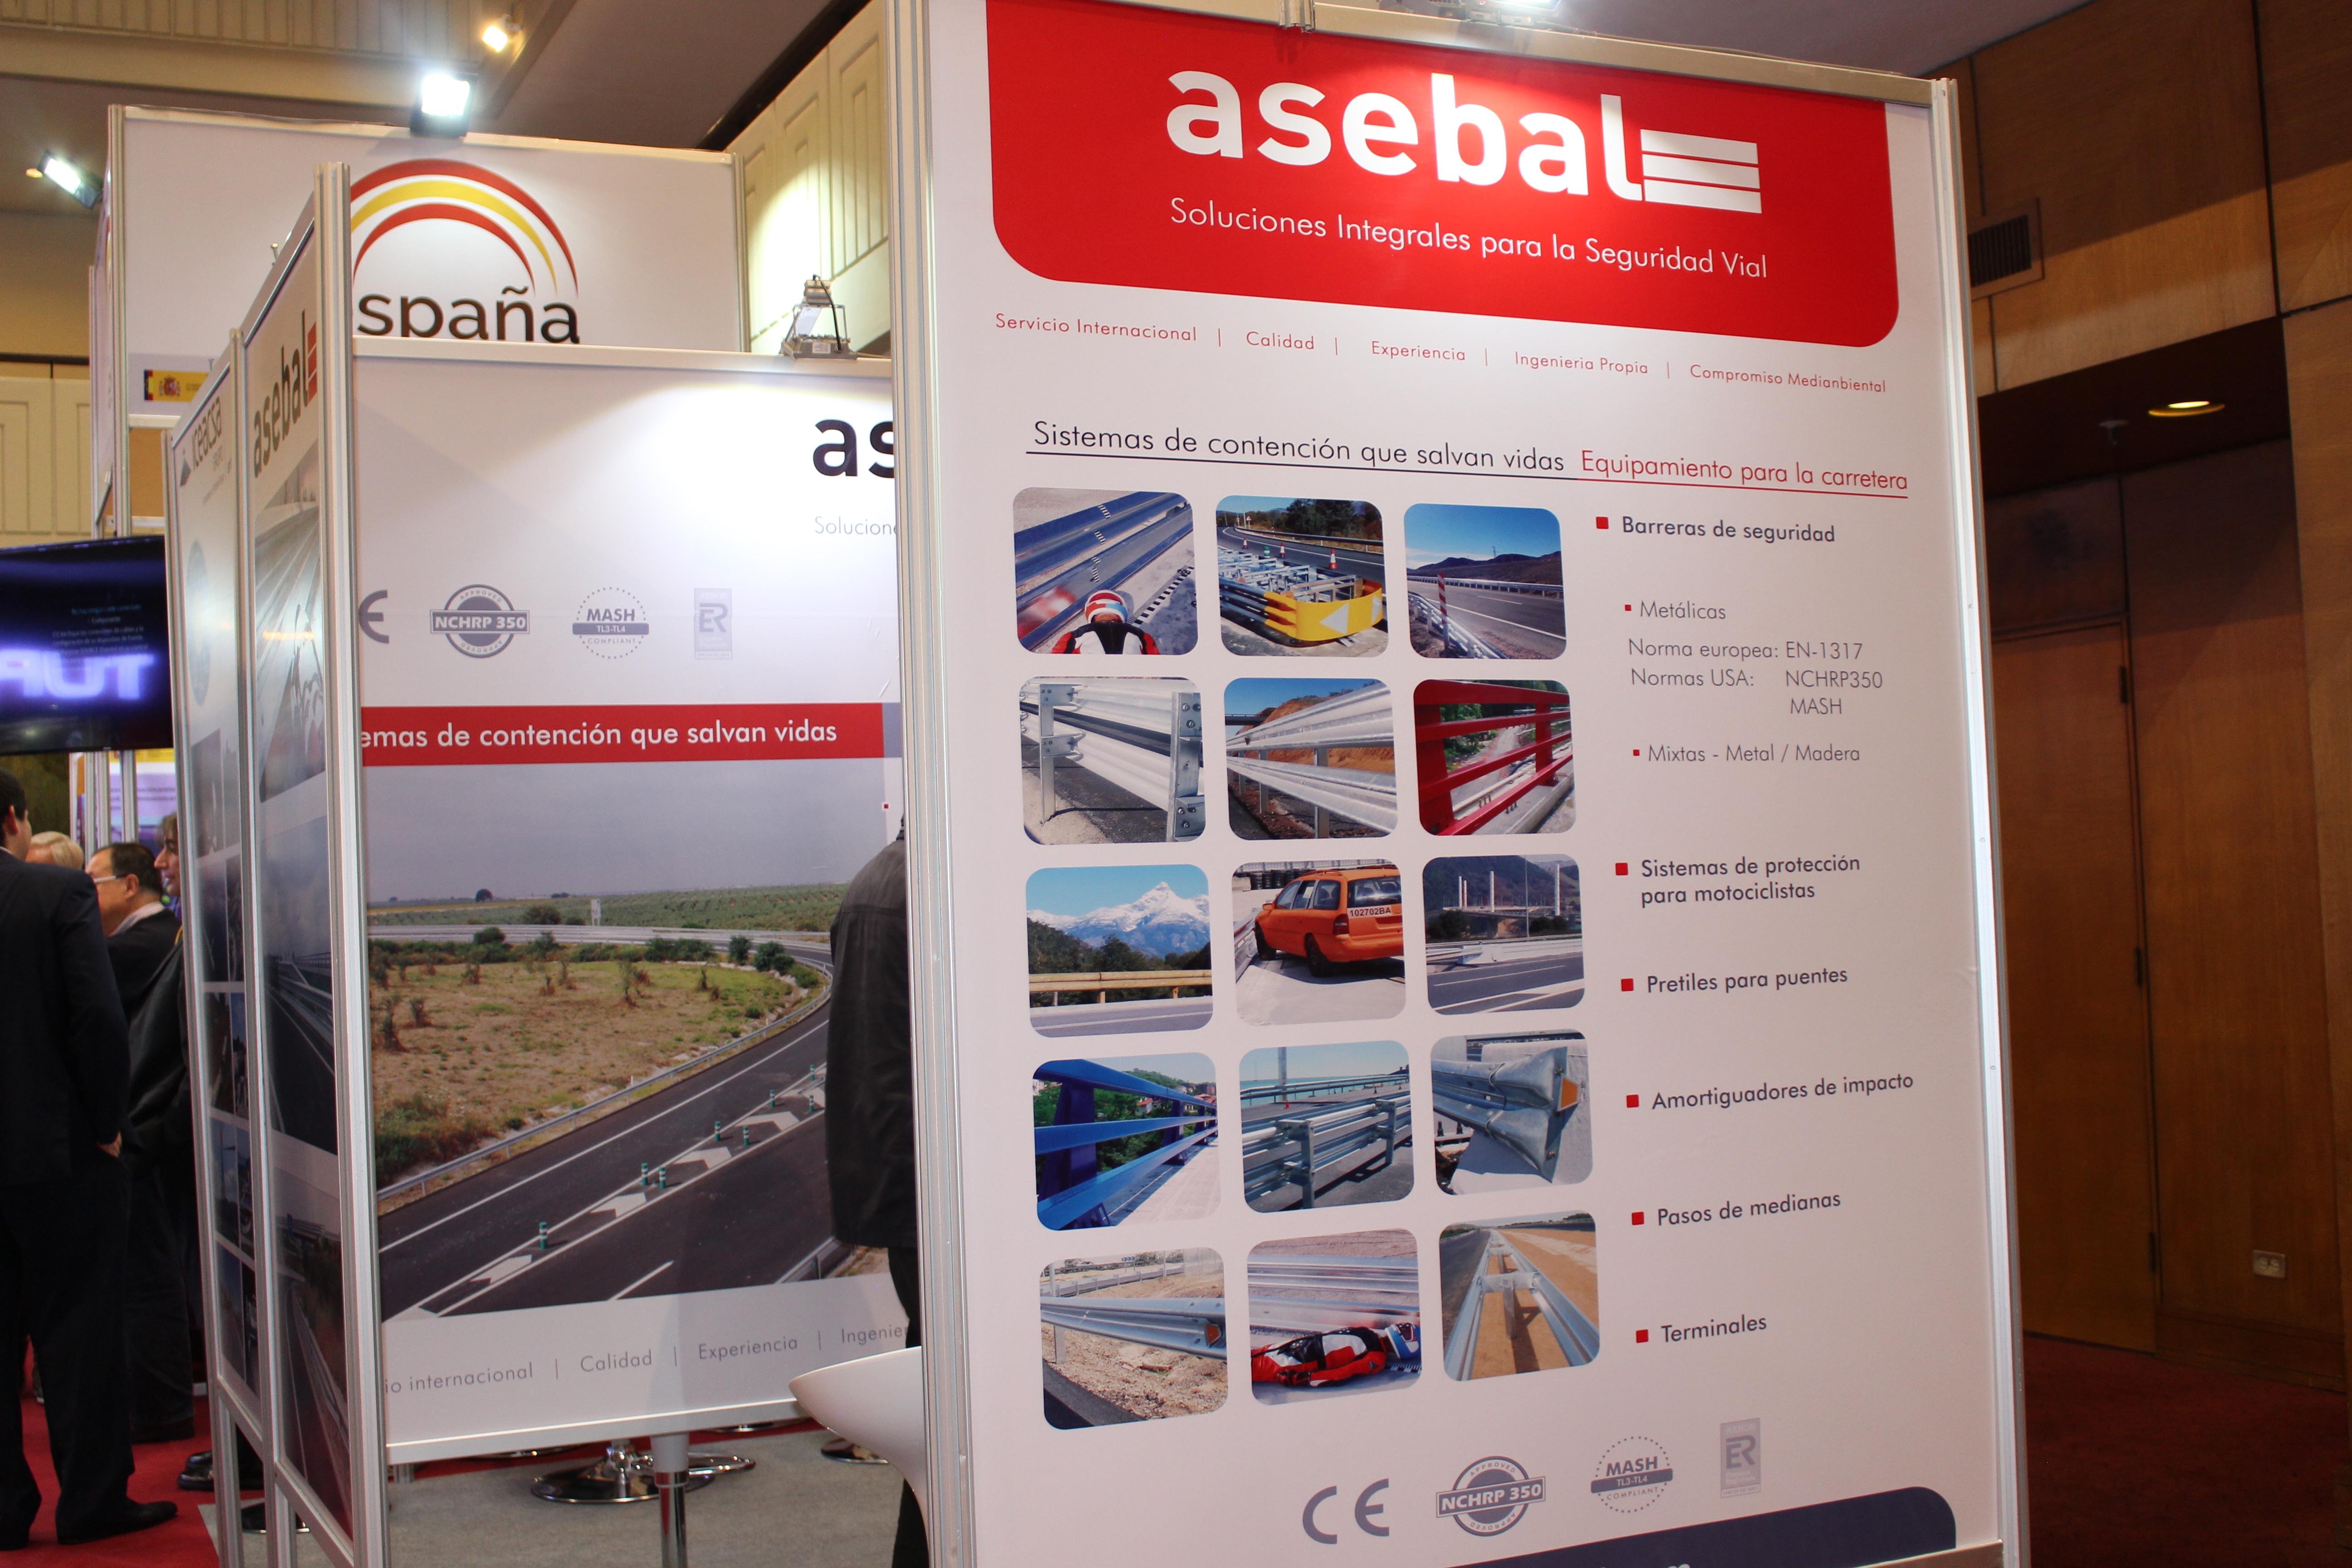 Asebal